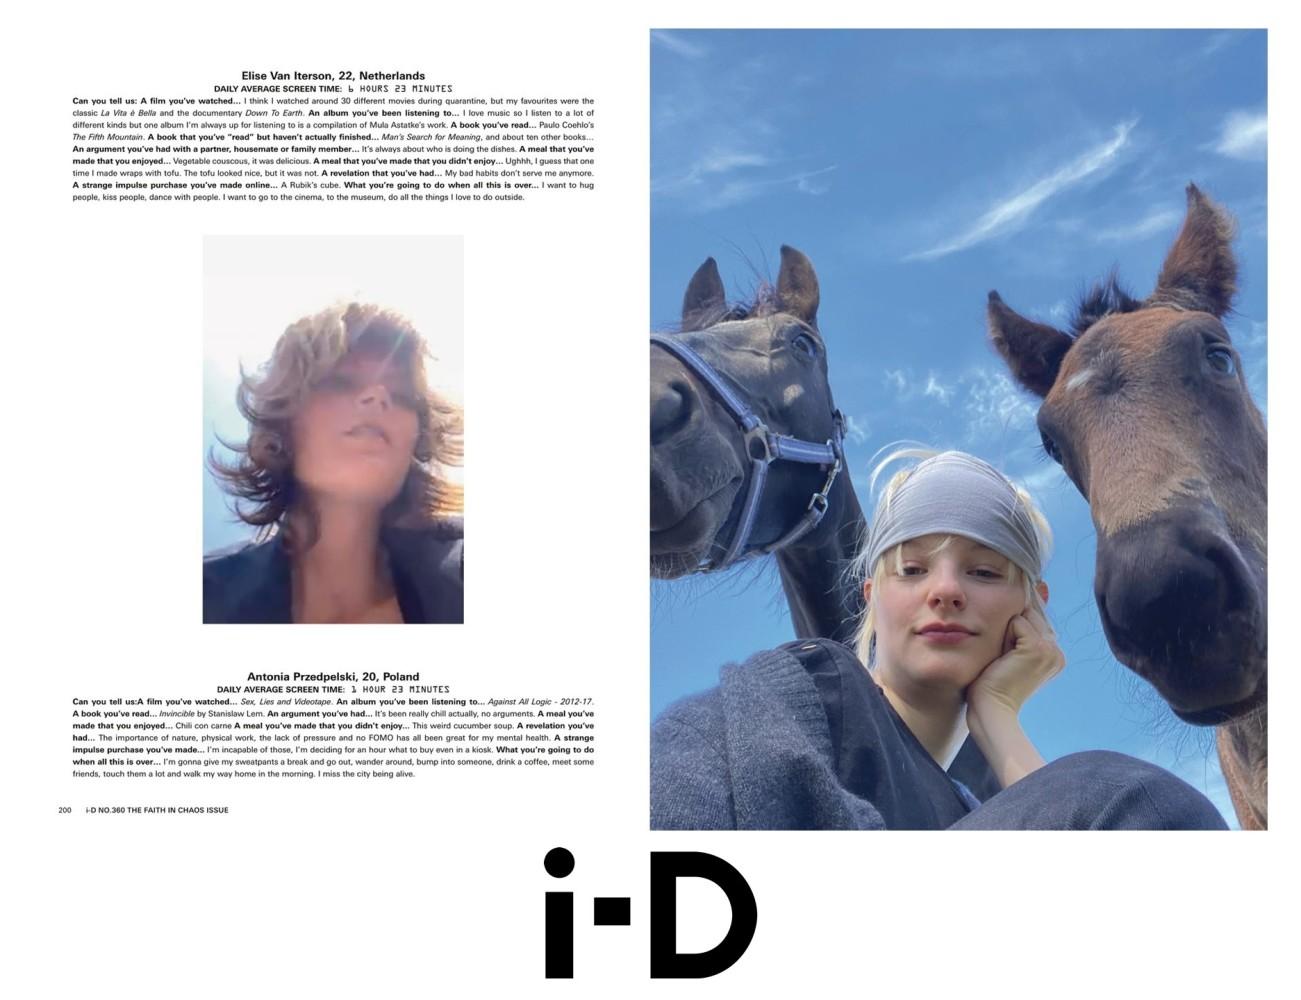 Antonia Przedpelski for i-D Magazine Summer 2020 Issue